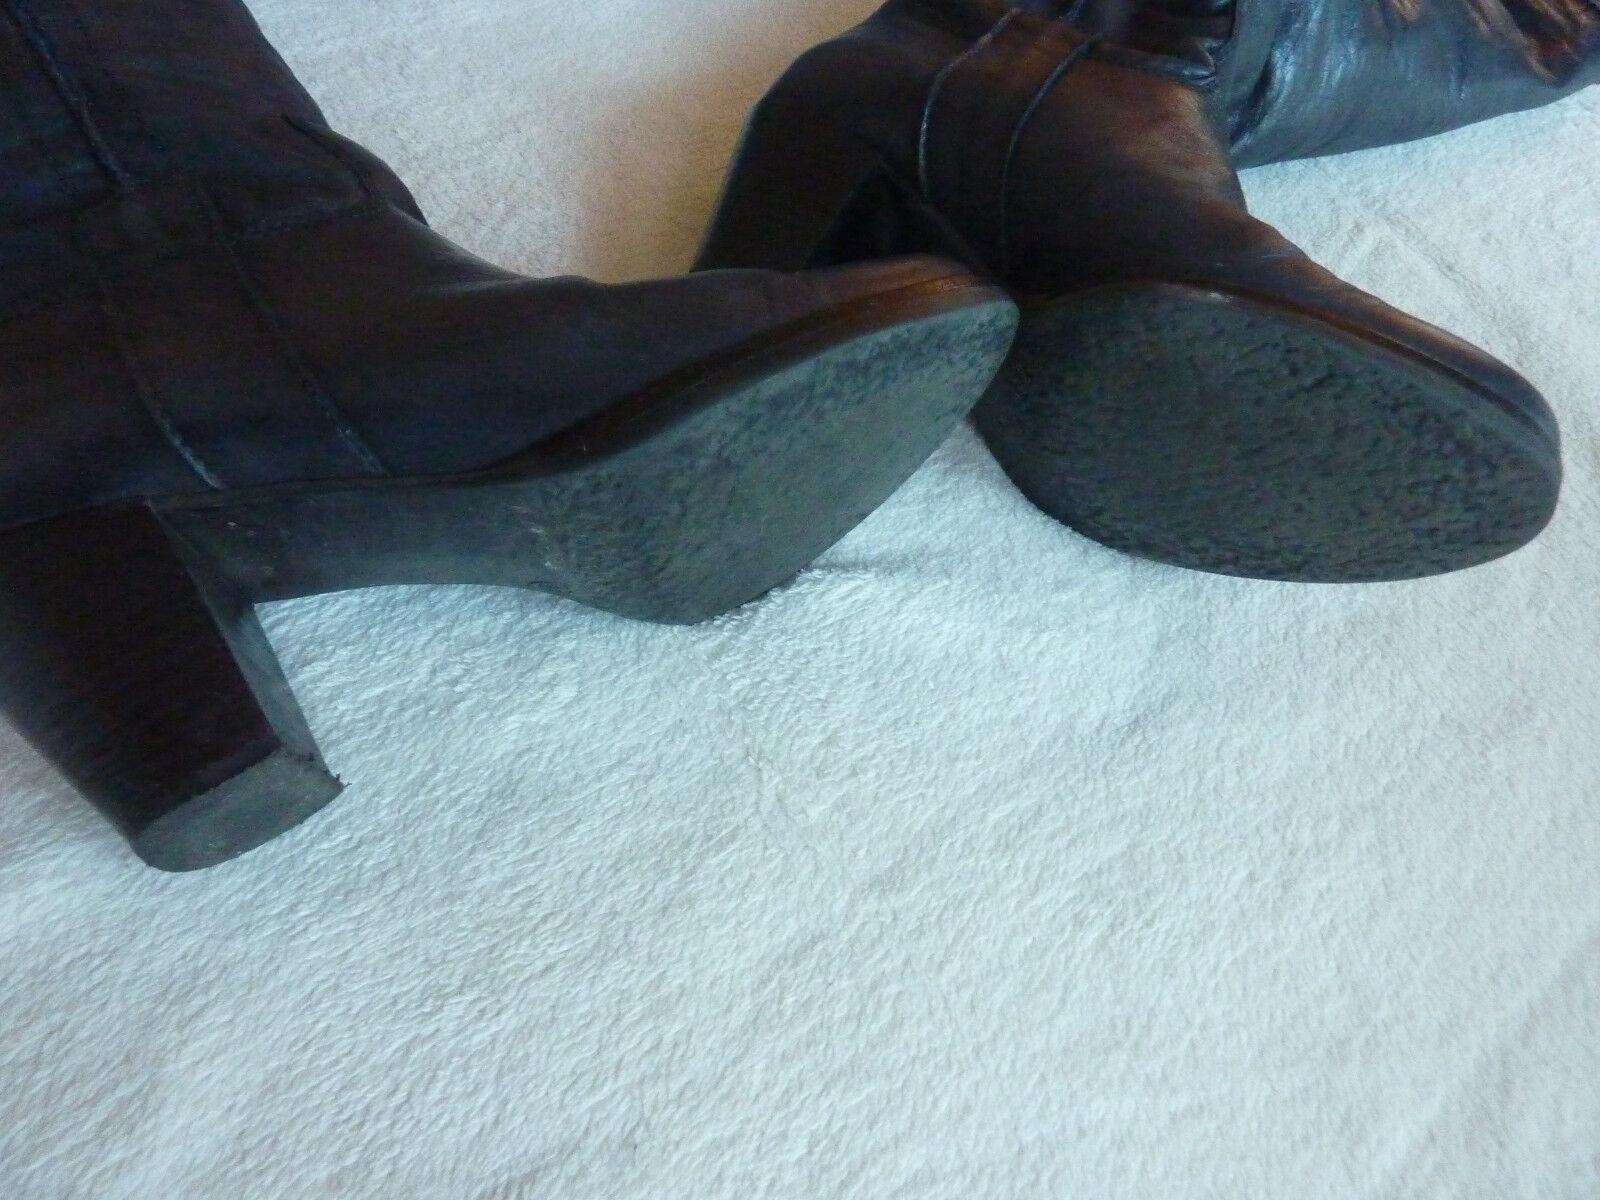 Stiefel hoch anthrazit Leder Damen Gr. 39